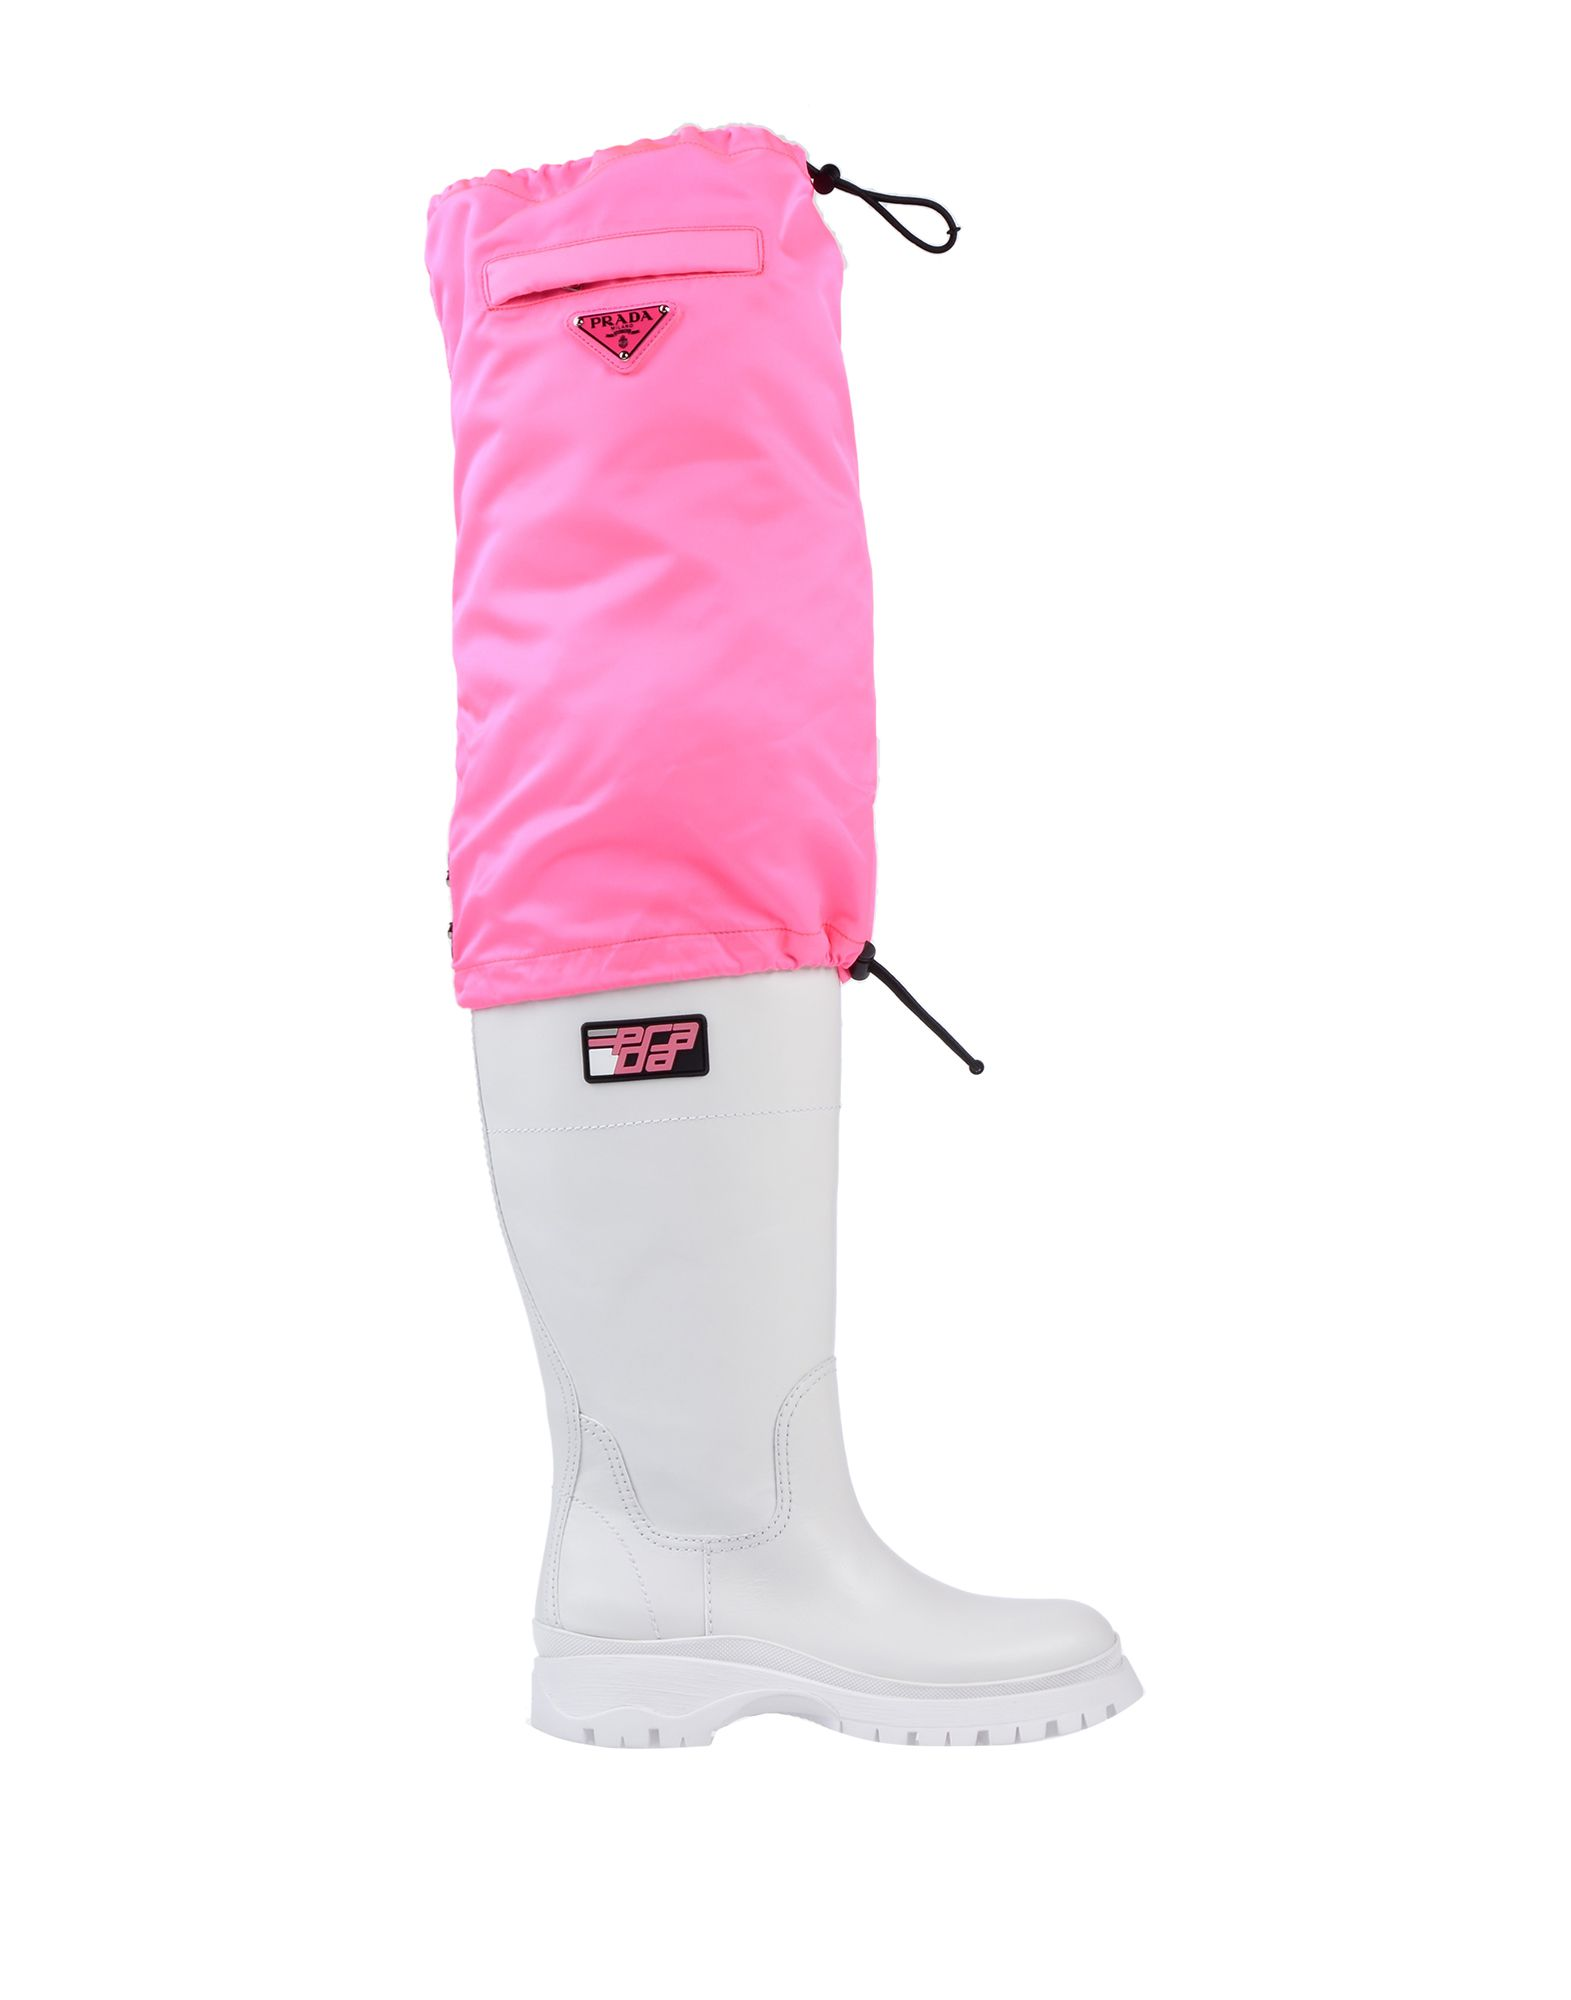 prada pink and white boots